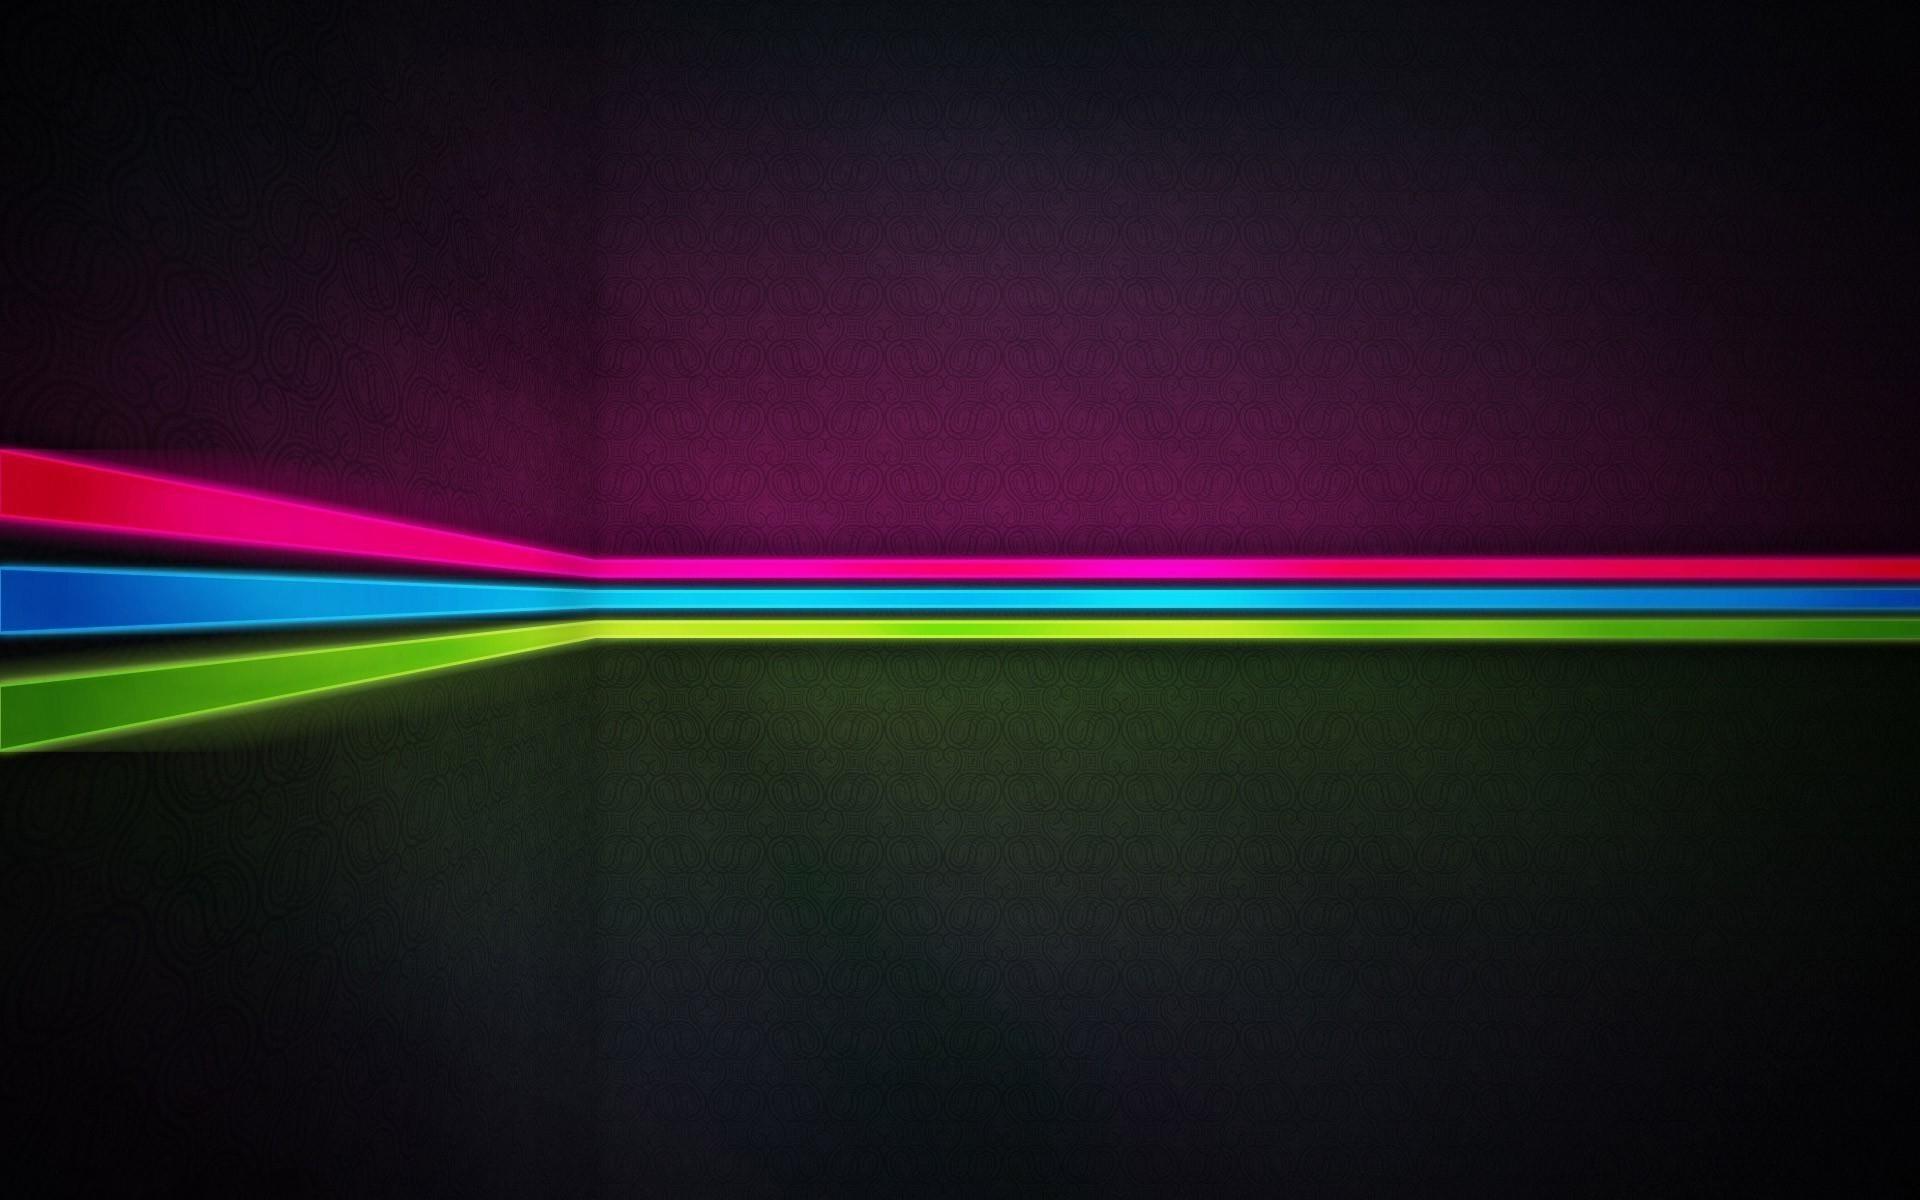 Neon stripes wallpaper Wallpaper Wide HD 1920x1200